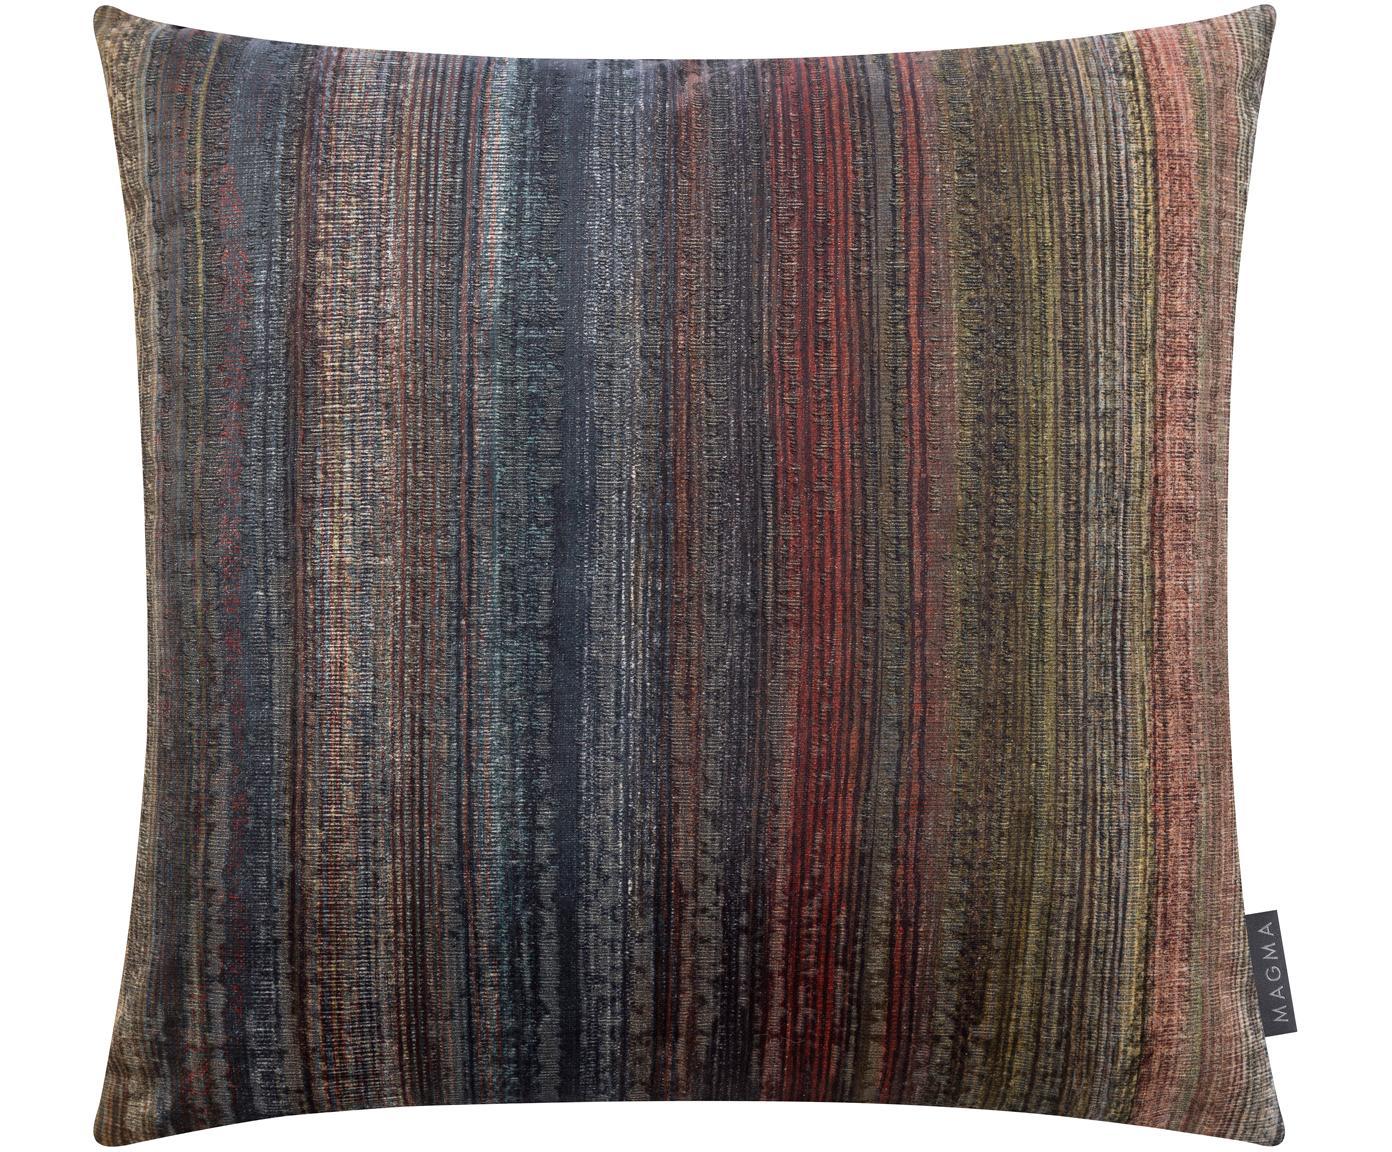 Samt-Kissenhülle Timon, Polyestersamt, Mehrfarbig, Petrolblau, 50 x 50 cm